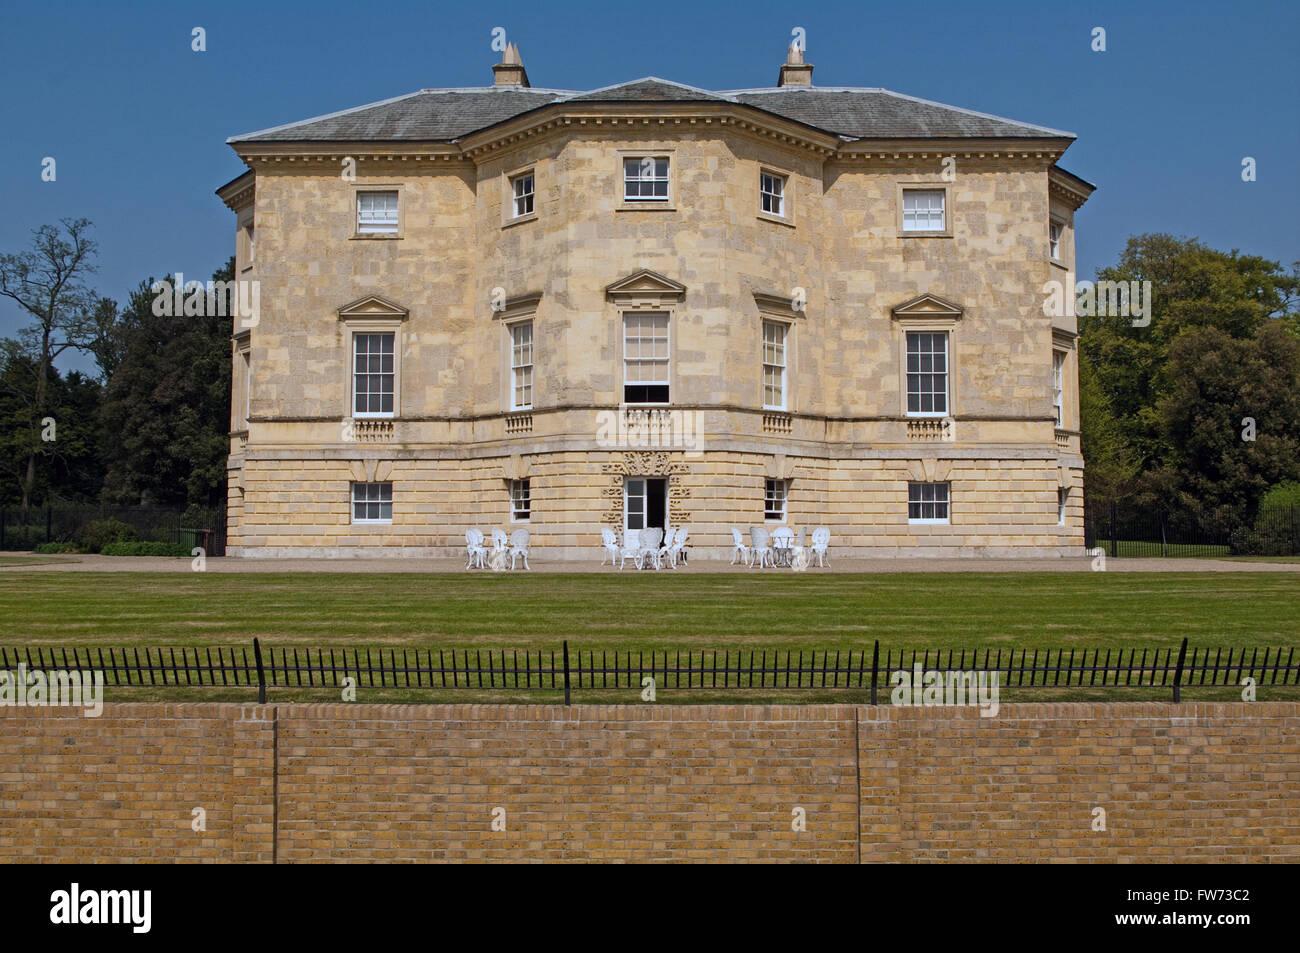 Danson House, Bexleyheath, Greater London, England, Immagini Stock